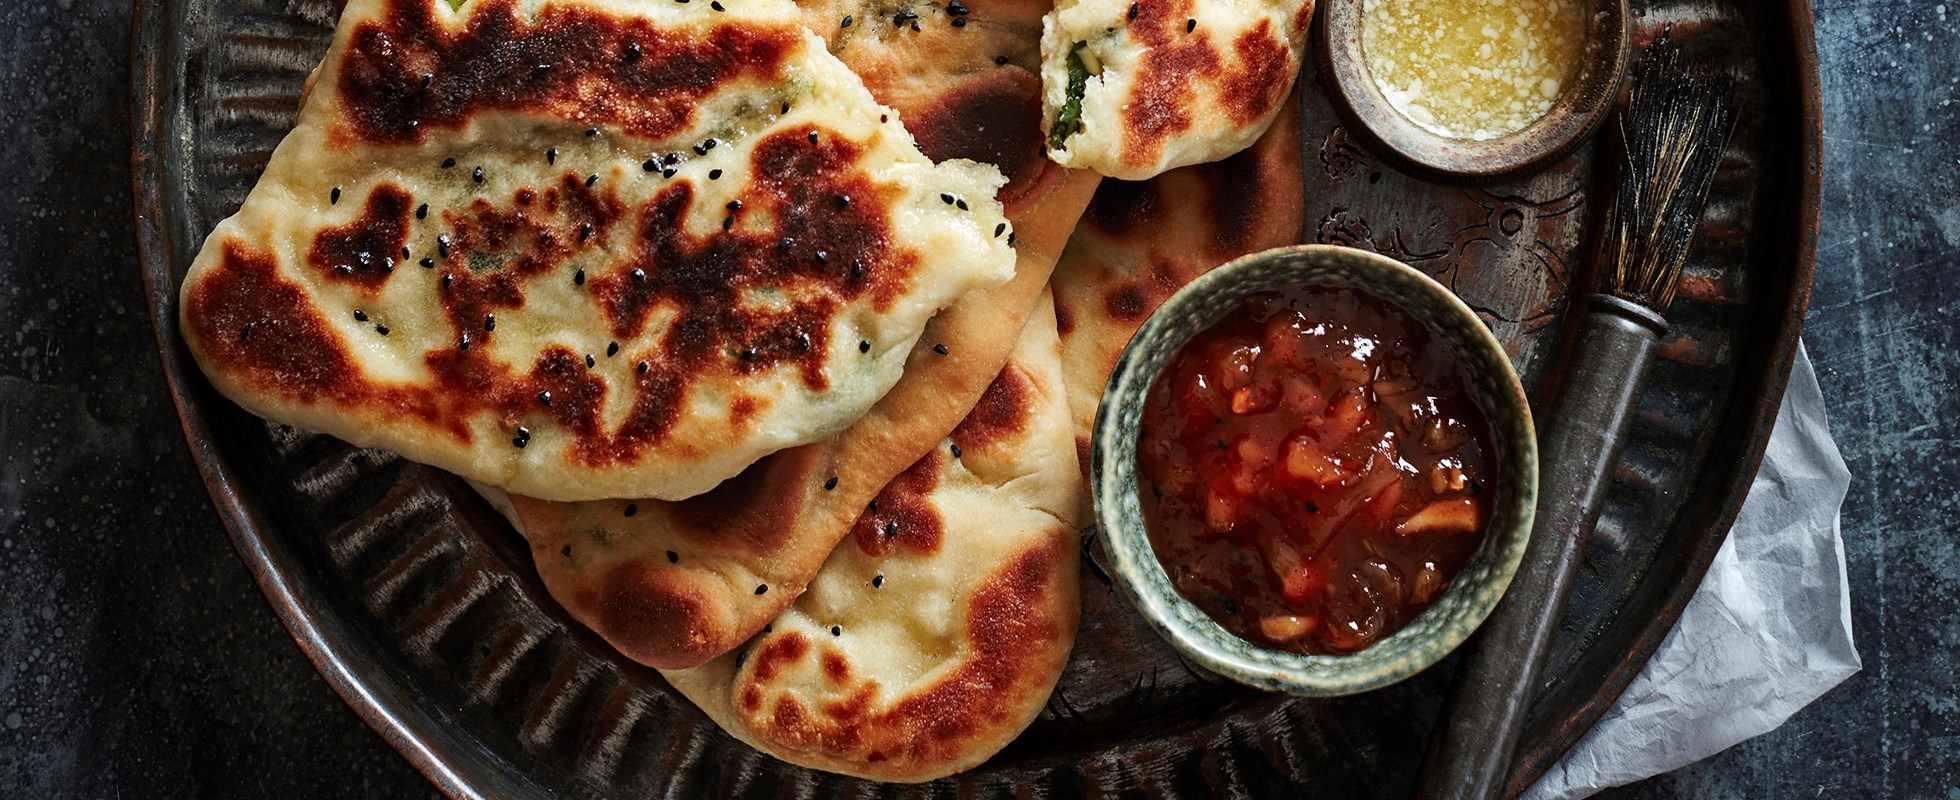 kale and paneer naan